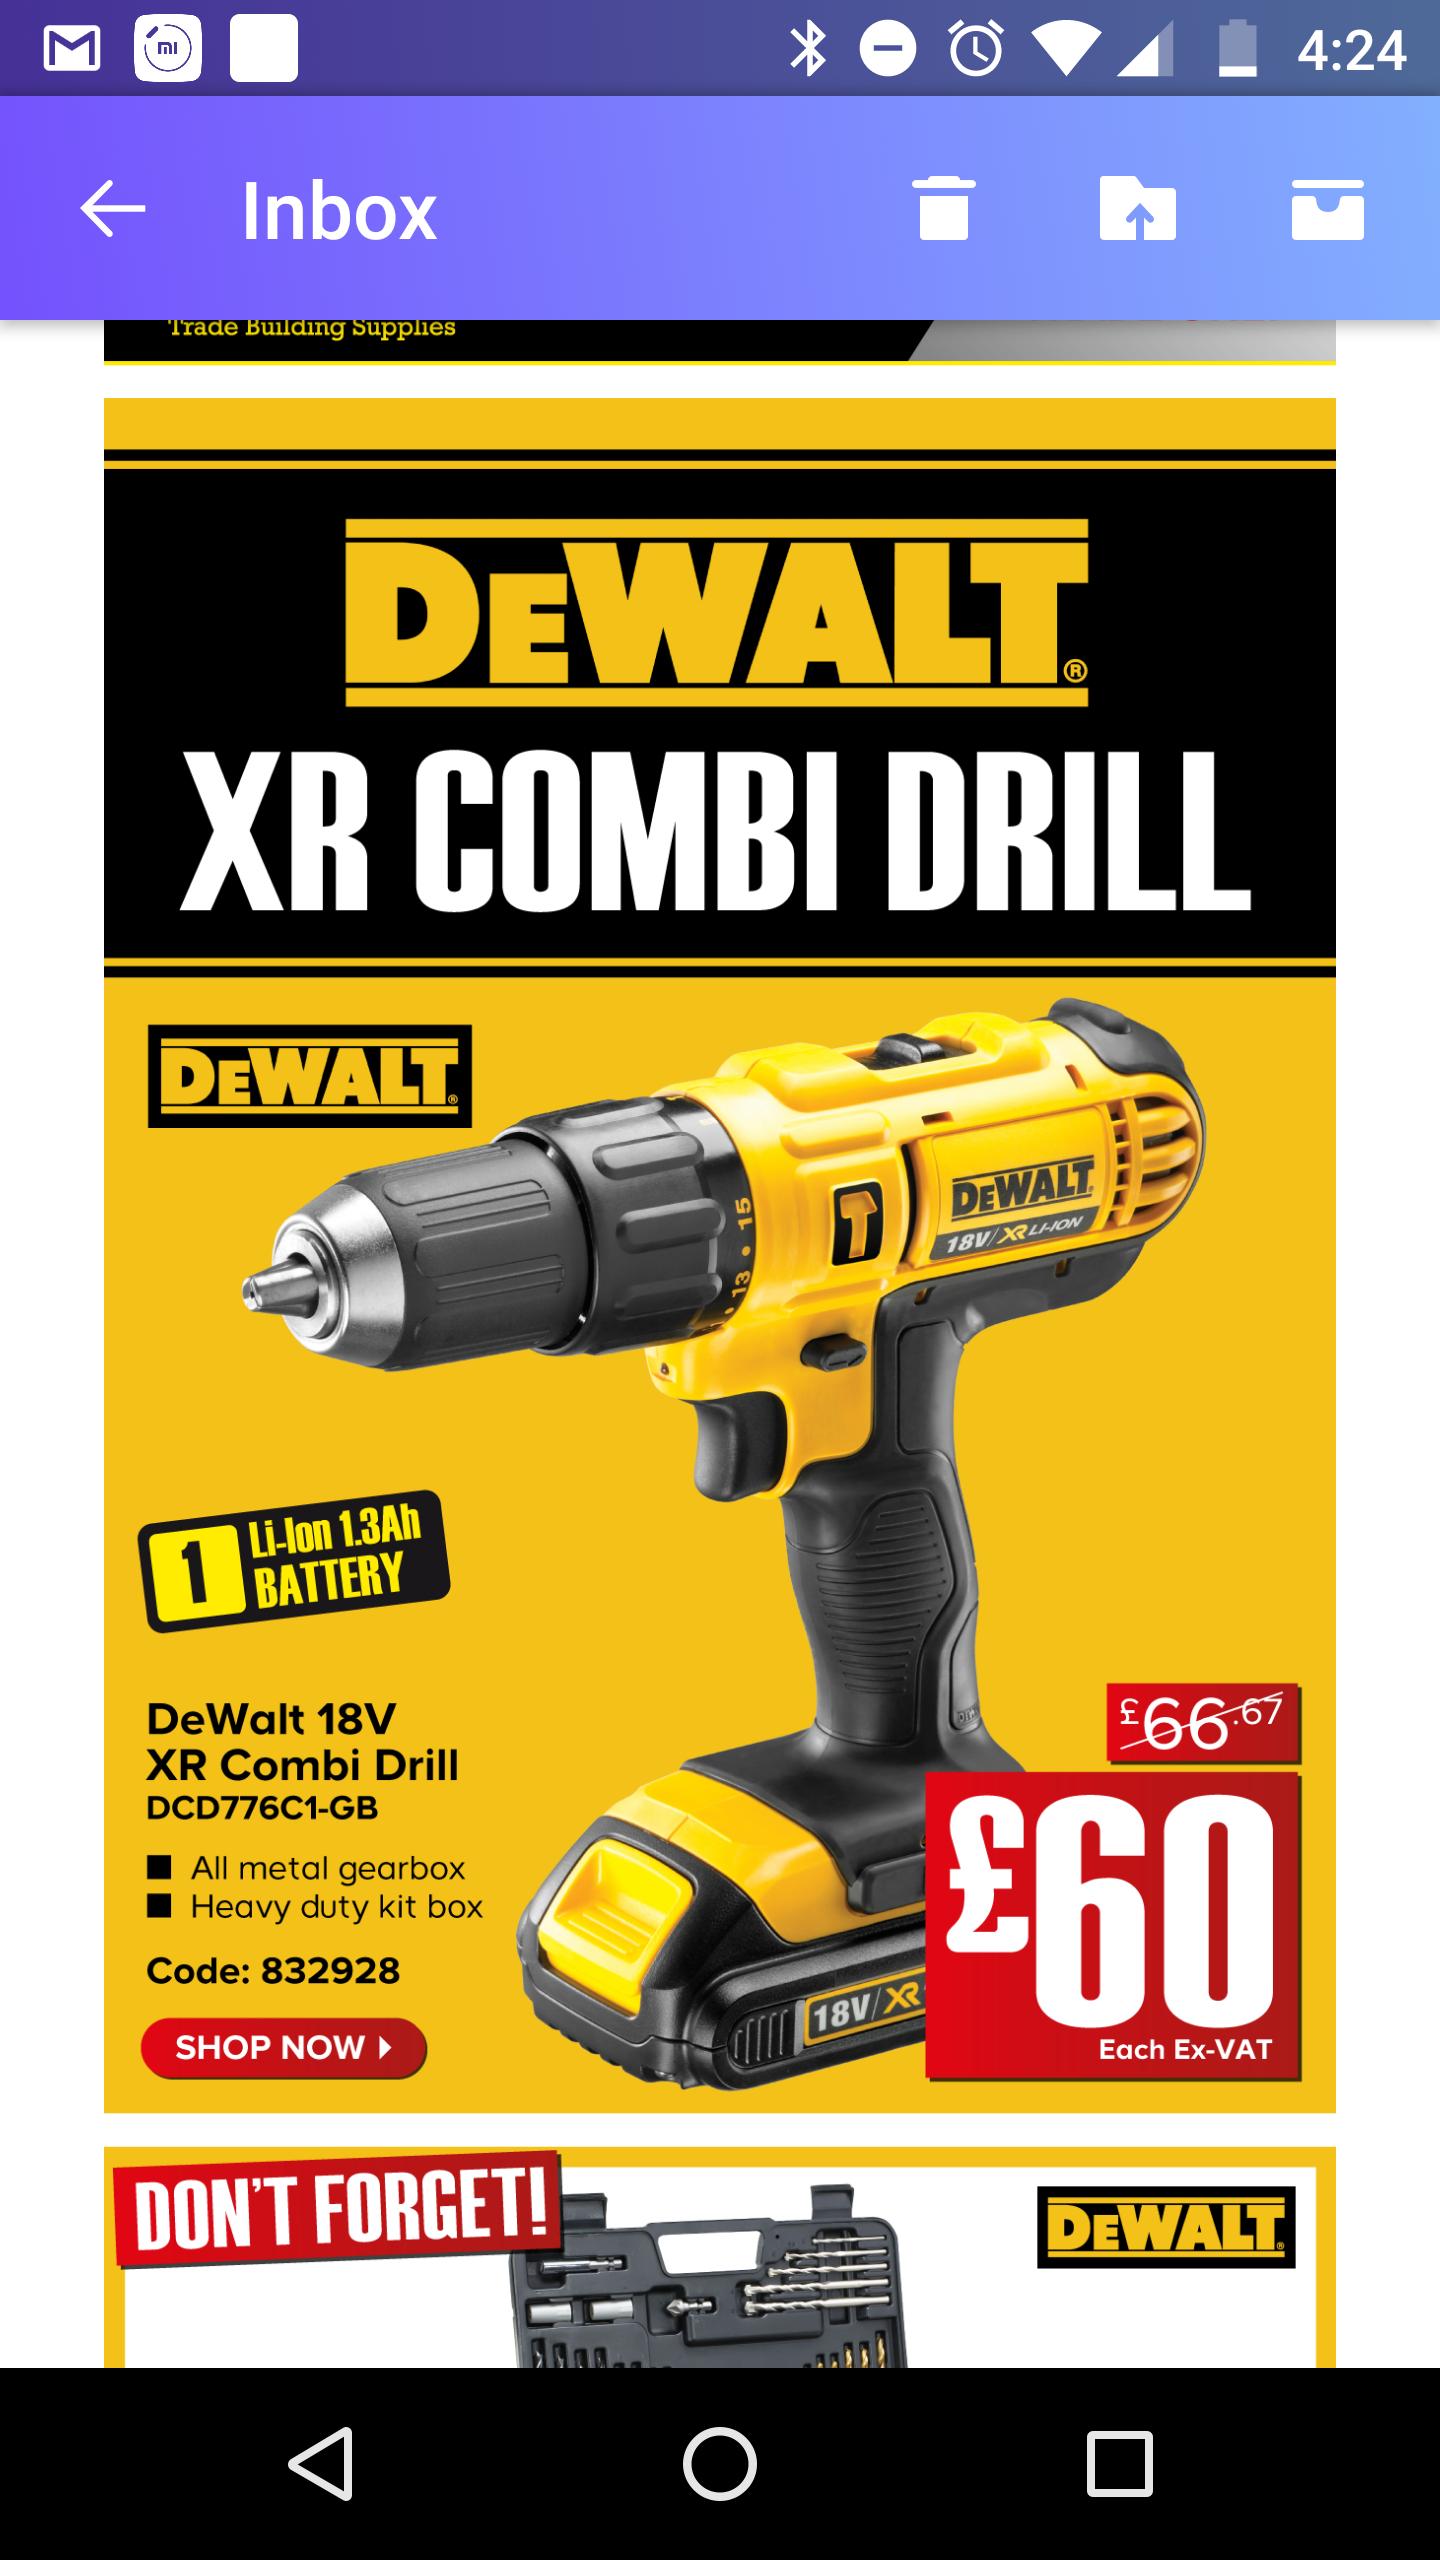 DEWALT XR CORDLESS 18V 10AH LI-ION COMBI DRILL 1 BATTERY DCD776C1-GB £60 plus VAT @ Trade Point